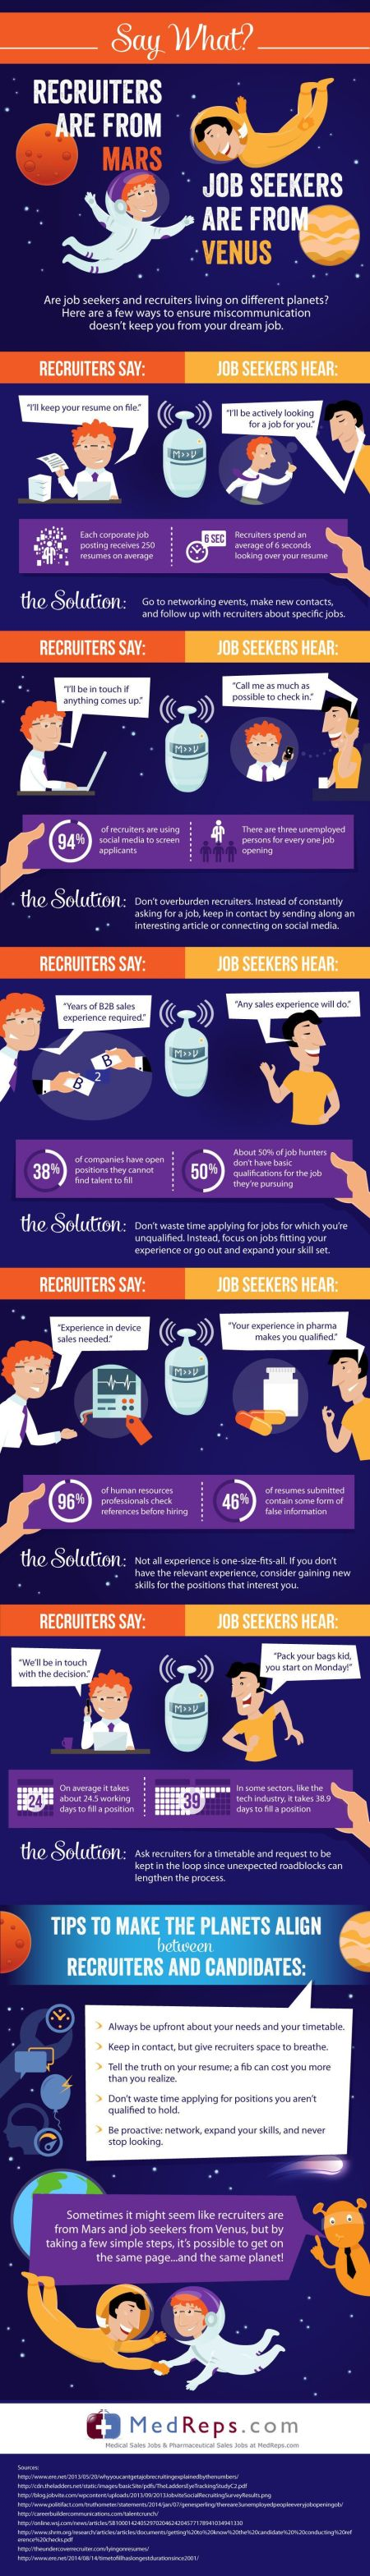 recruiters recruiter musings share this